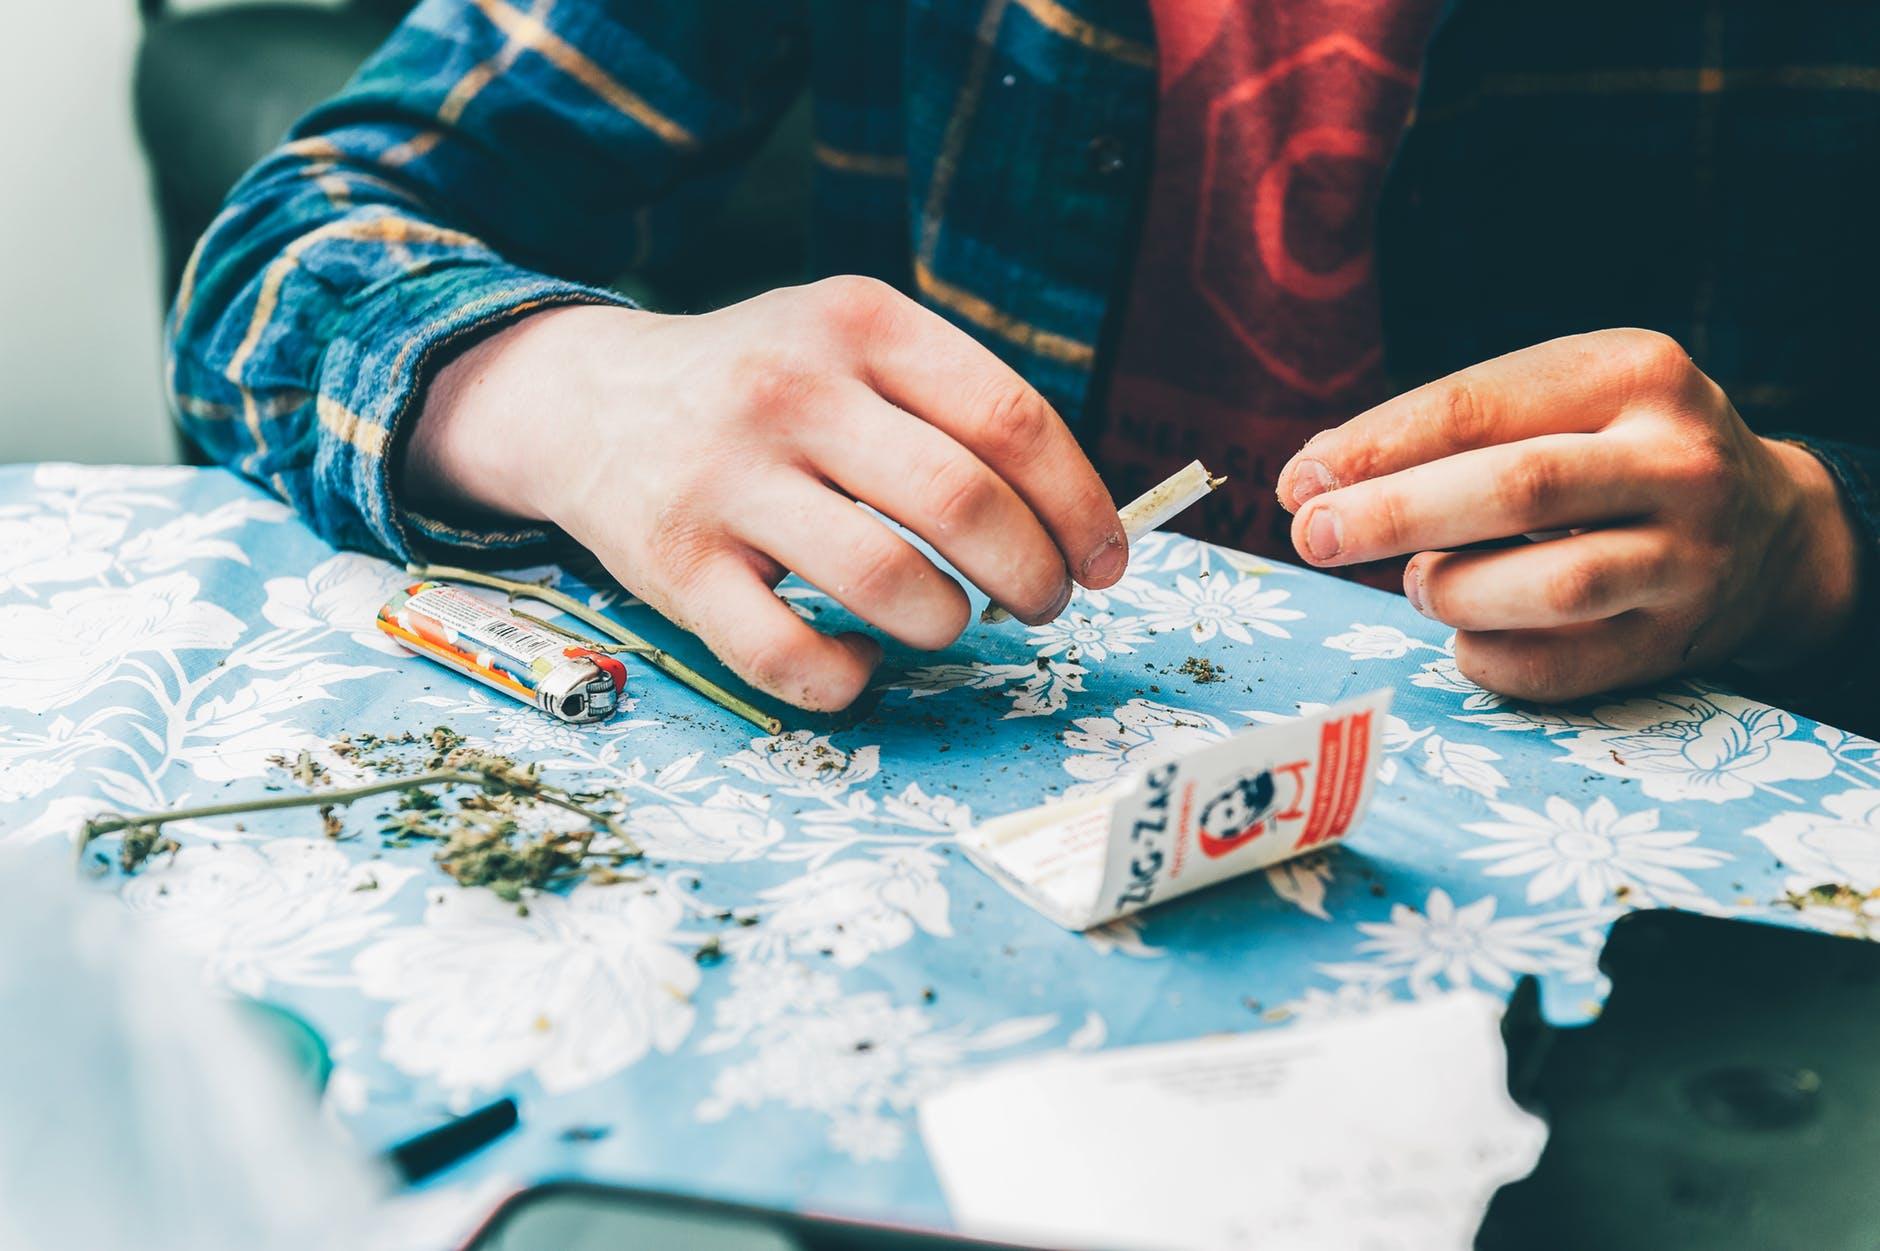 Medical Marijuana Law in Utah to be Revised